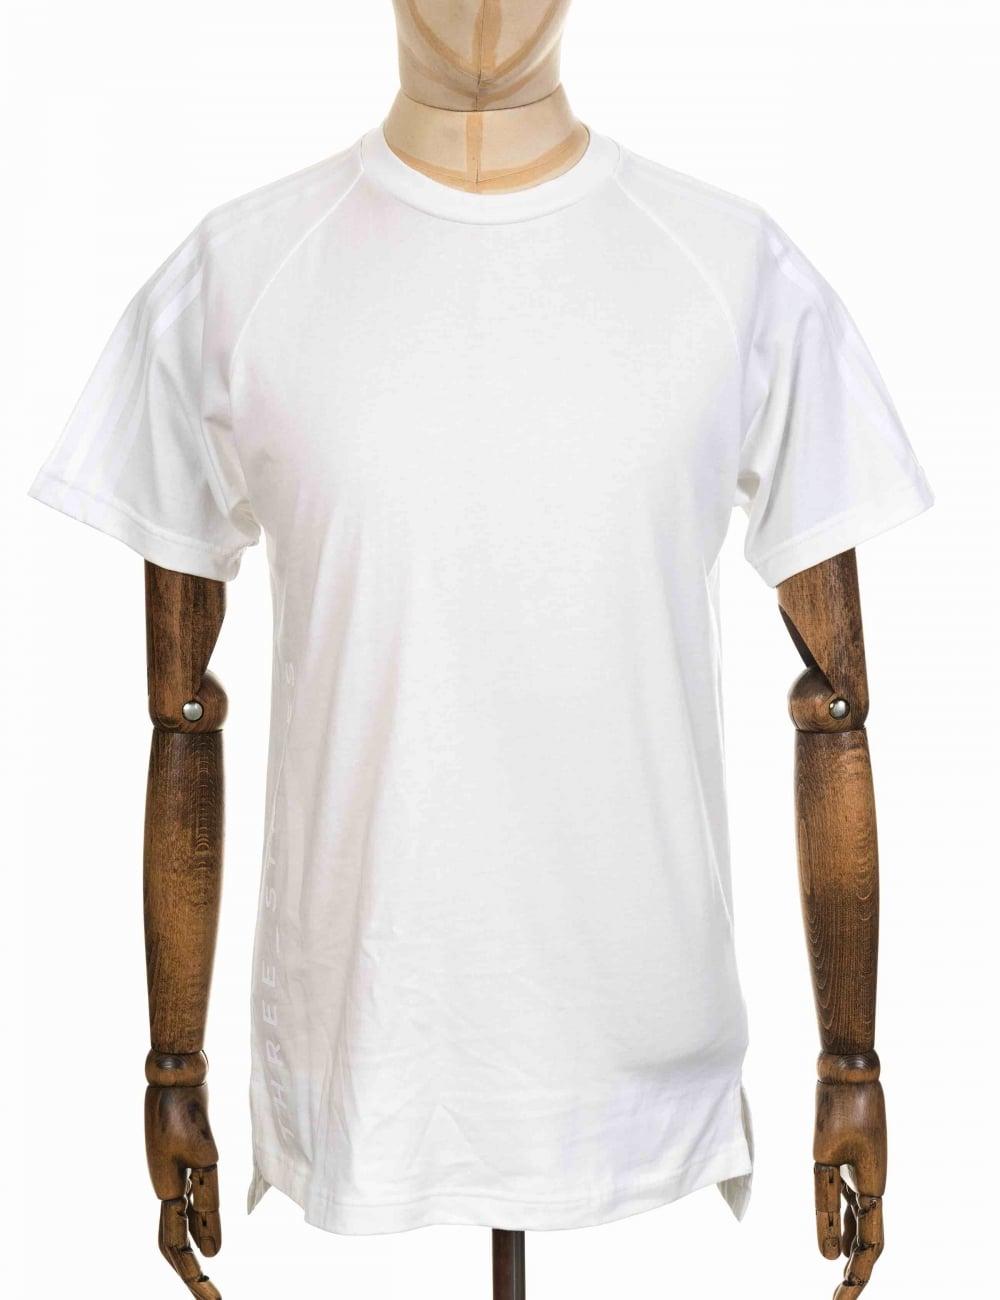 1f28e0664c508 Adidas Originals NMD Tee - White - Clothing from Fat Buddha Store UK